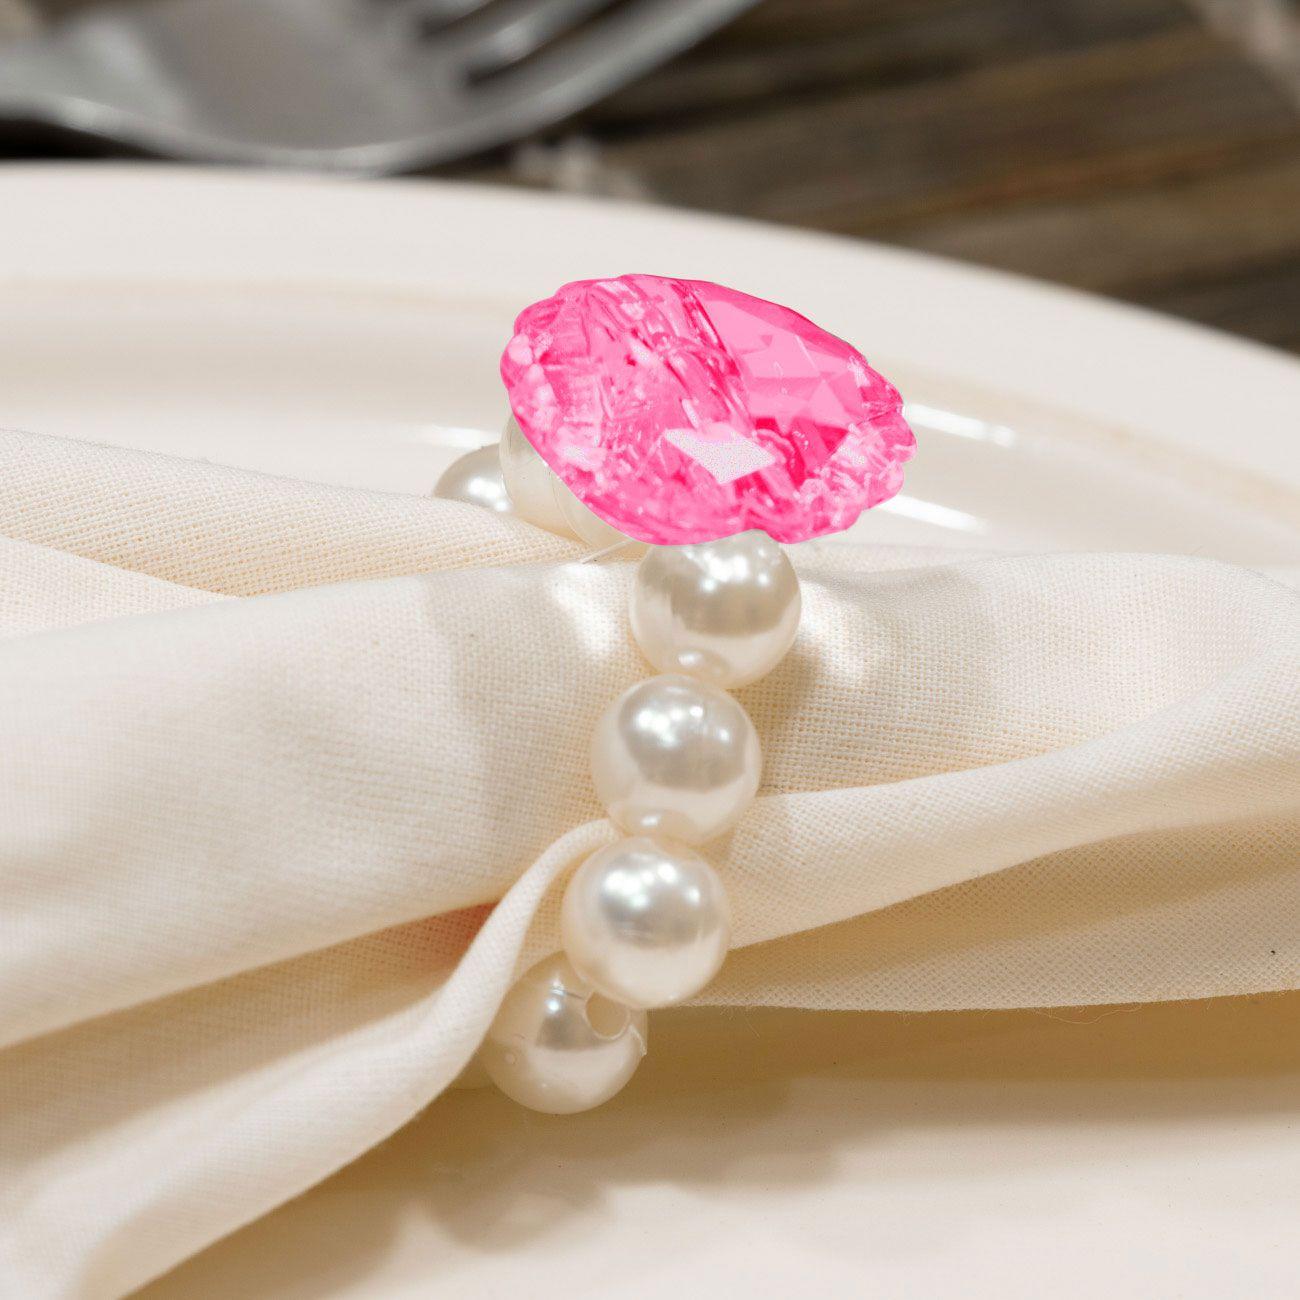 Kit 4 Peças Abraçadeira Prendedor Porta Guardanapo Pérola Pingente Cristal Pink para Mesa de 4 Lugares